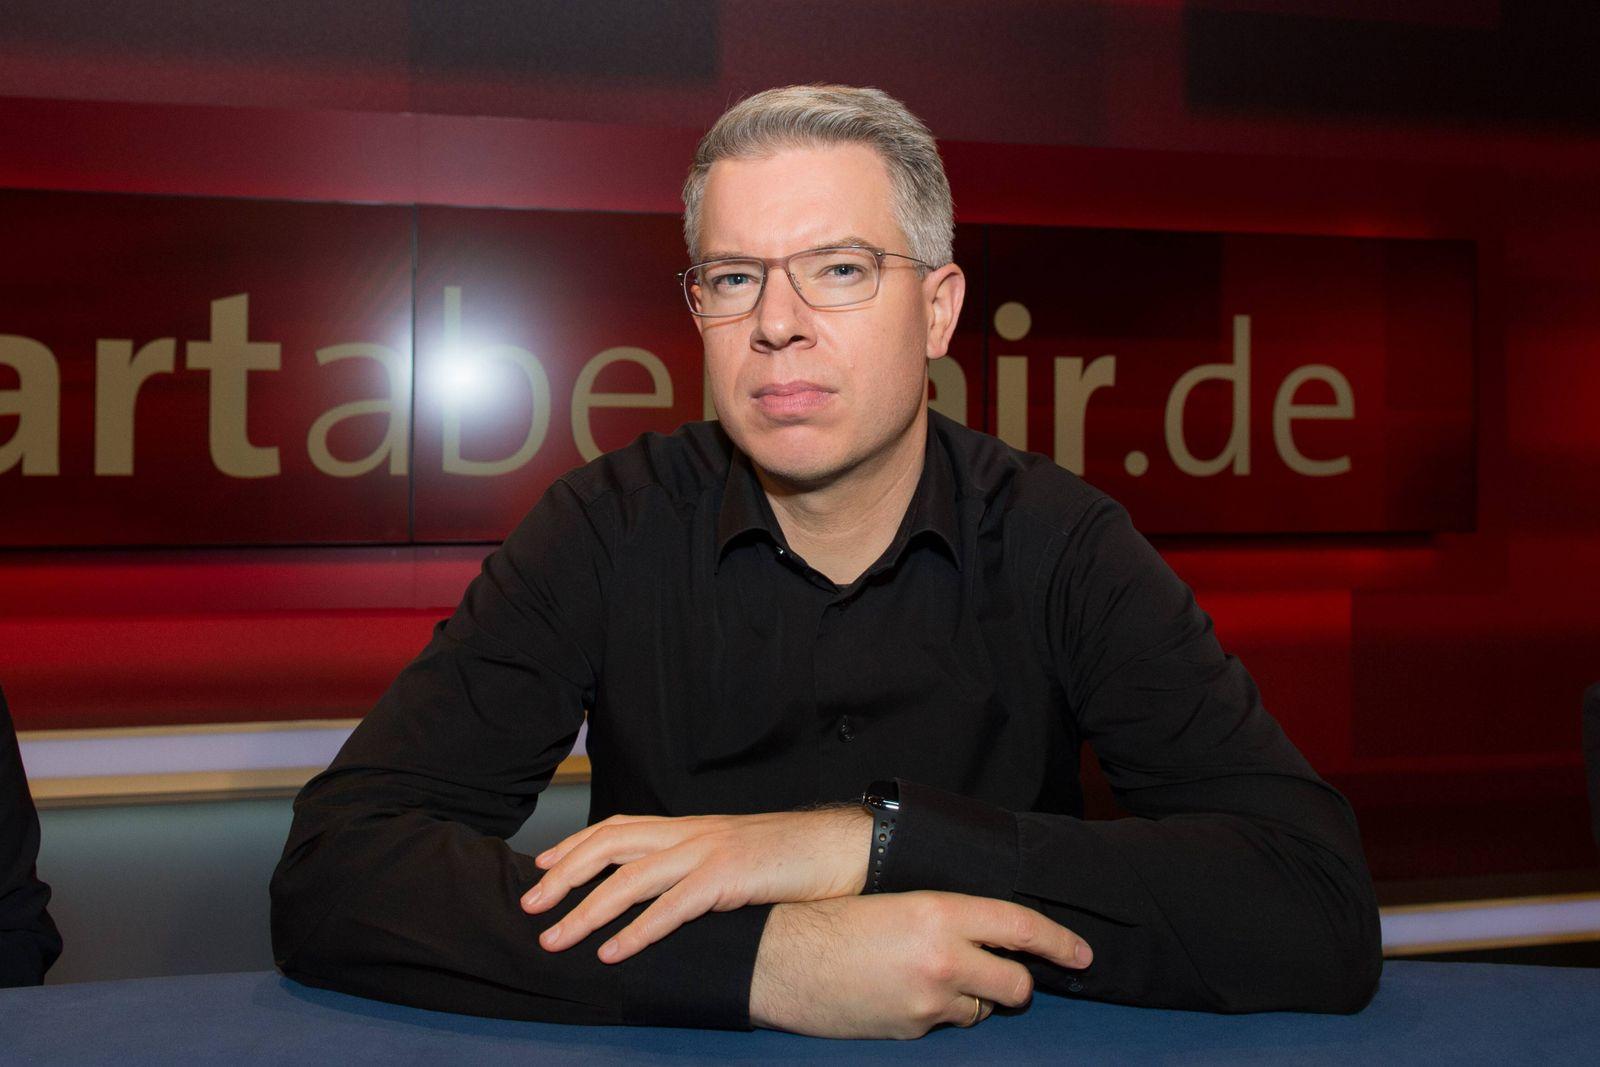 Berlin GER 10 12 2018 Berlin Adlershof hart aber fair mit Frank Plasberg Thema Hier Funkloc